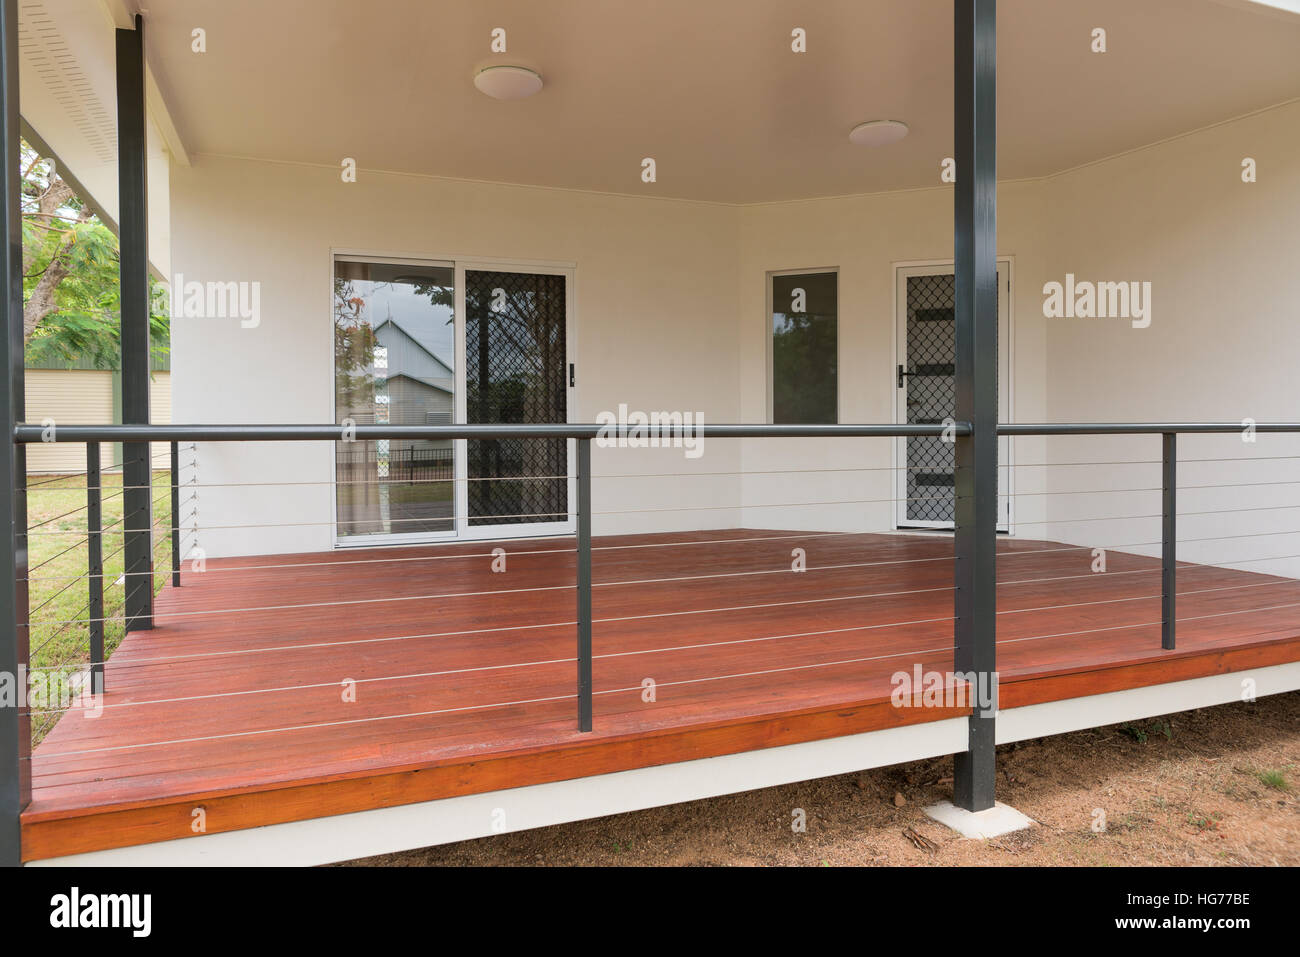 Balcony Timber Stockfotos & Balcony Timber Bilder - Alamy